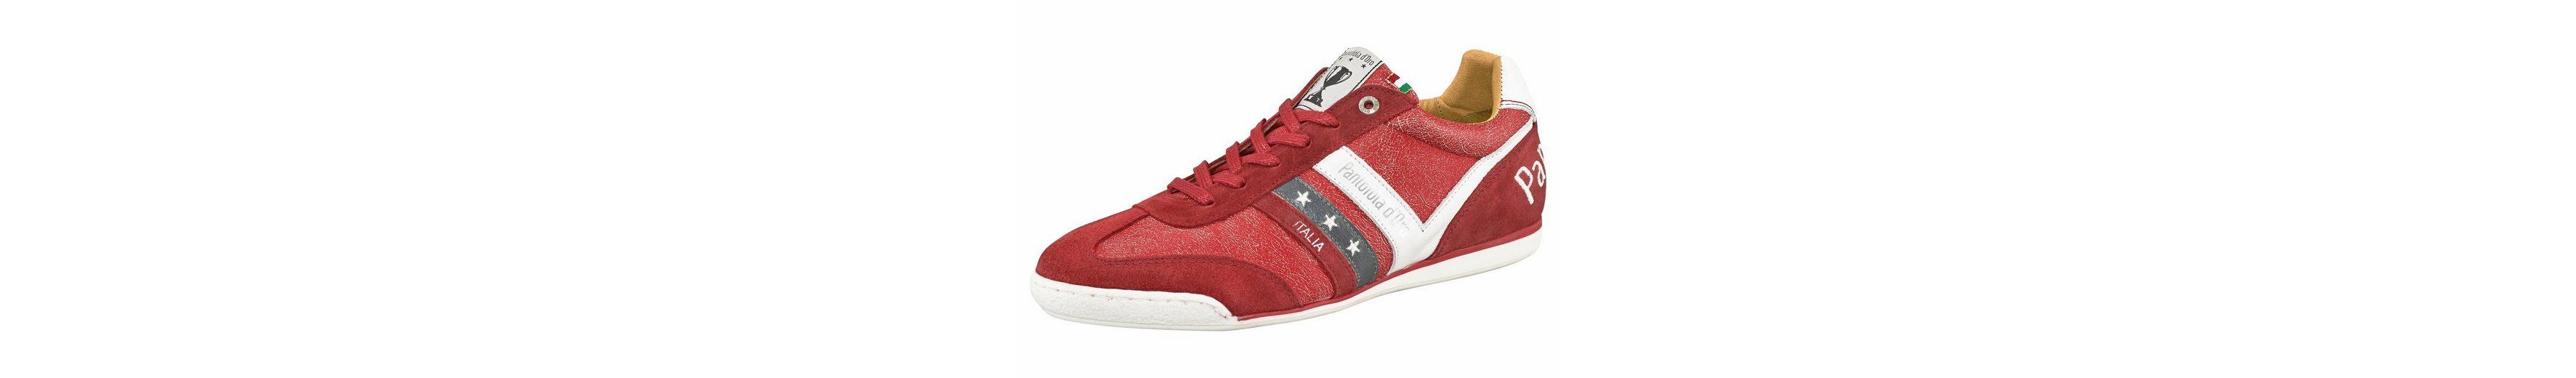 Pantofola d´Oro Vasto Funky Uomo Low Sneaker Auslass Zahlung Mit Visa Eh3rBMgbYI